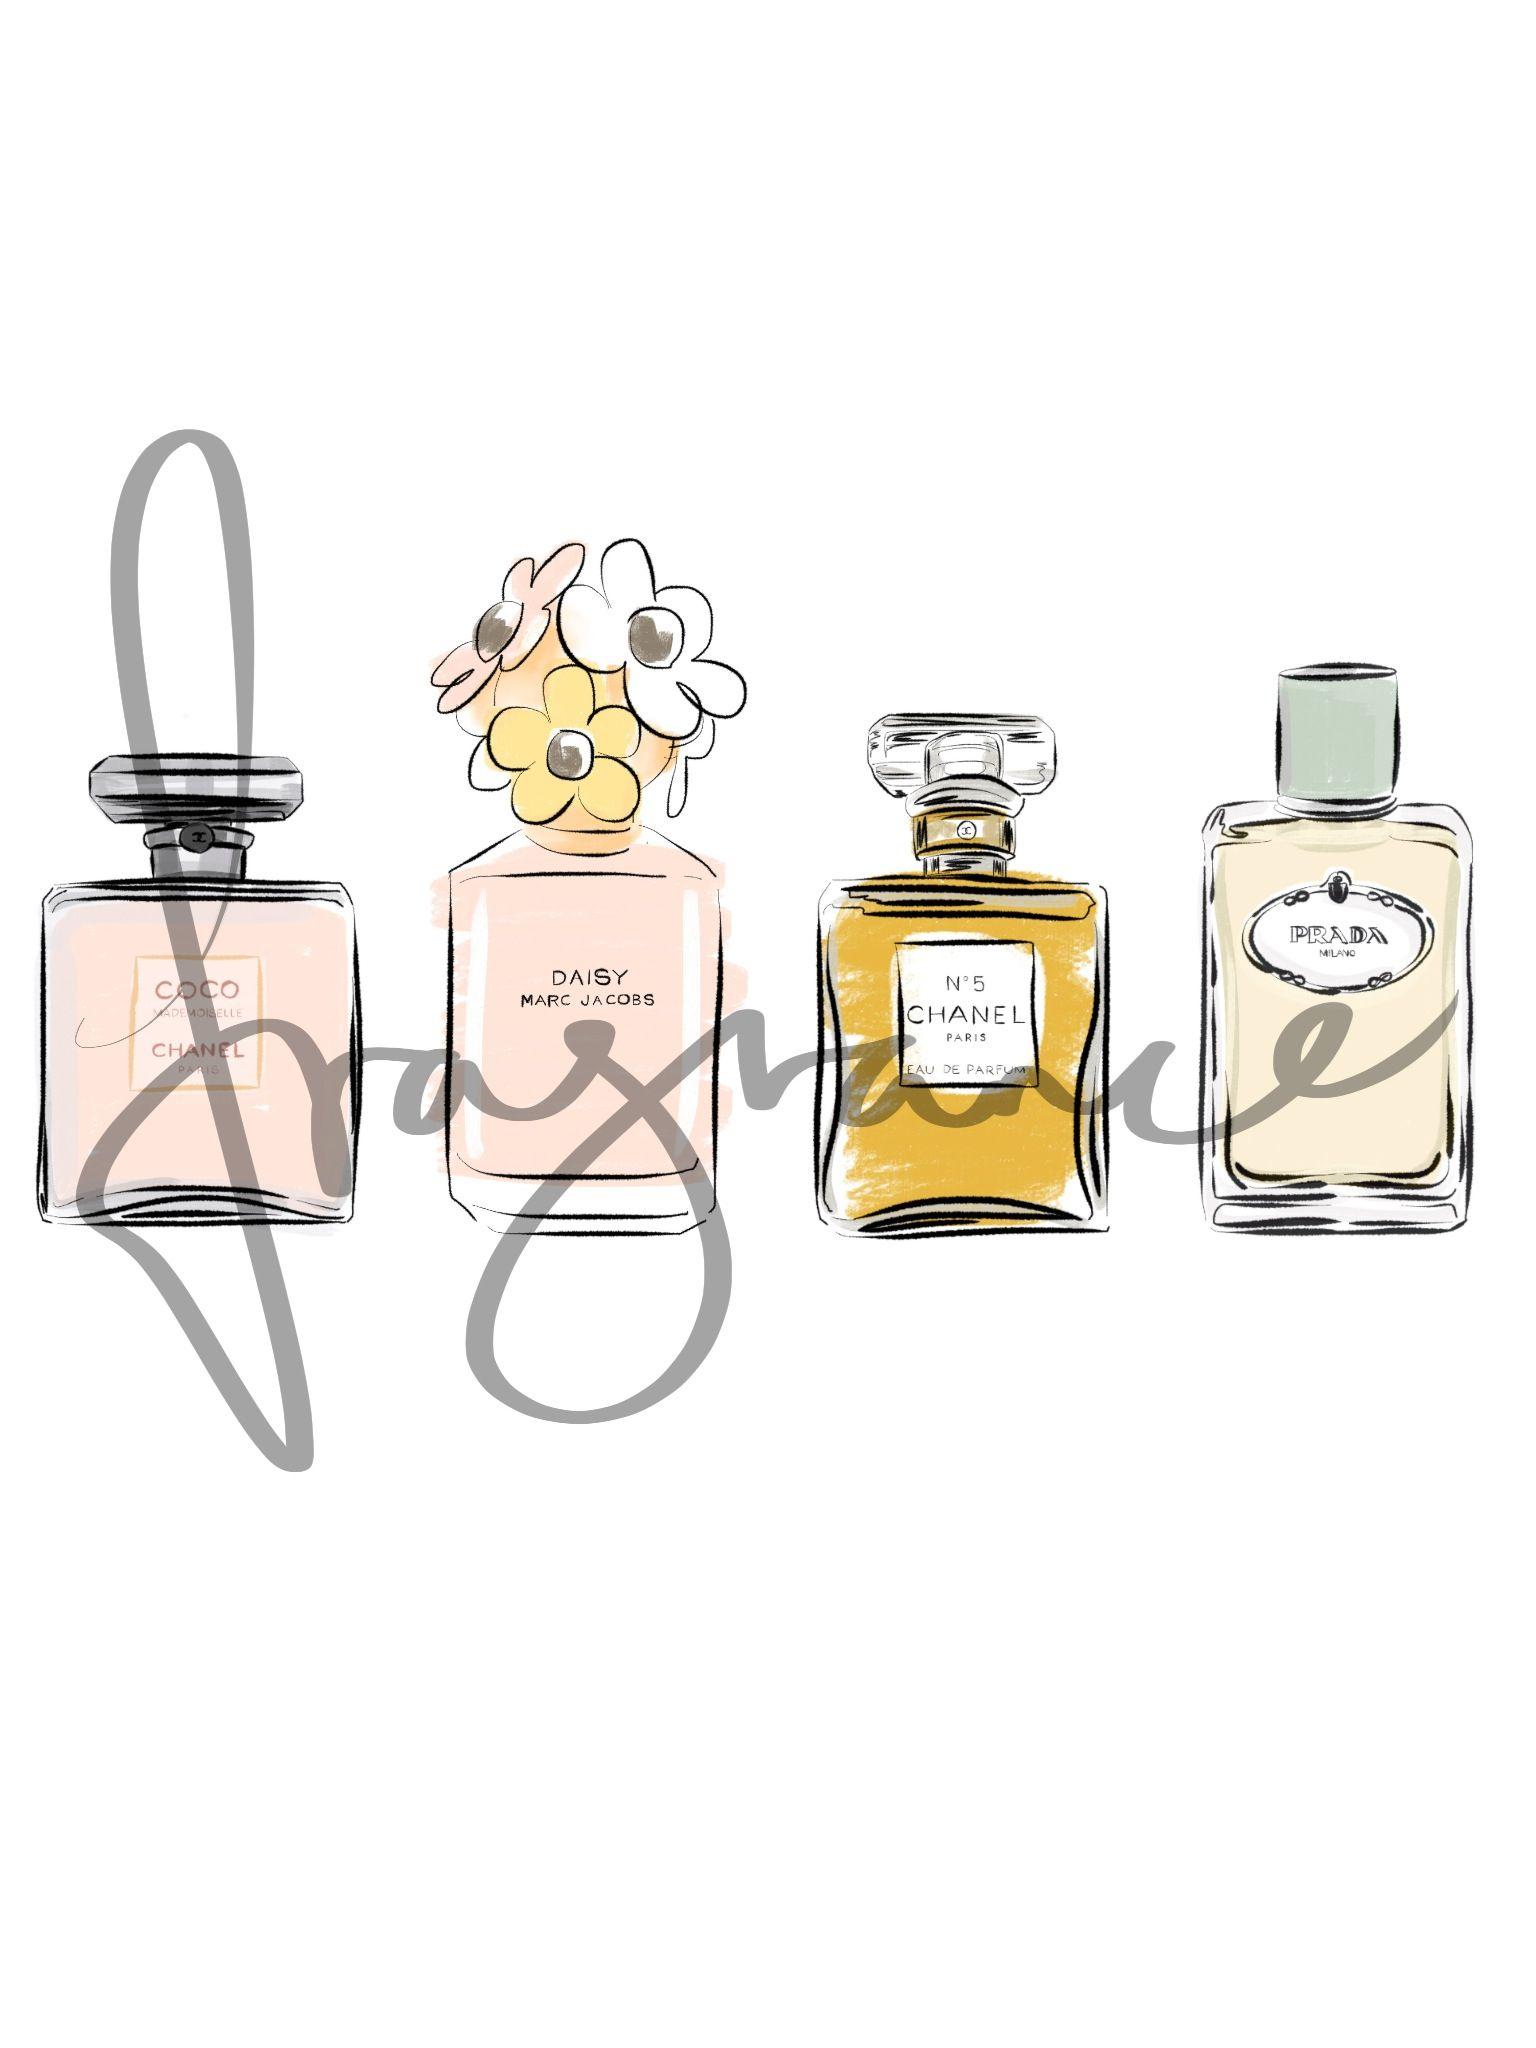 Fragrance  Perfume bottles - Chanel, Marc Jacobs, Prada  www.sallycotterill.co.uk Sally Cotterill © 2013